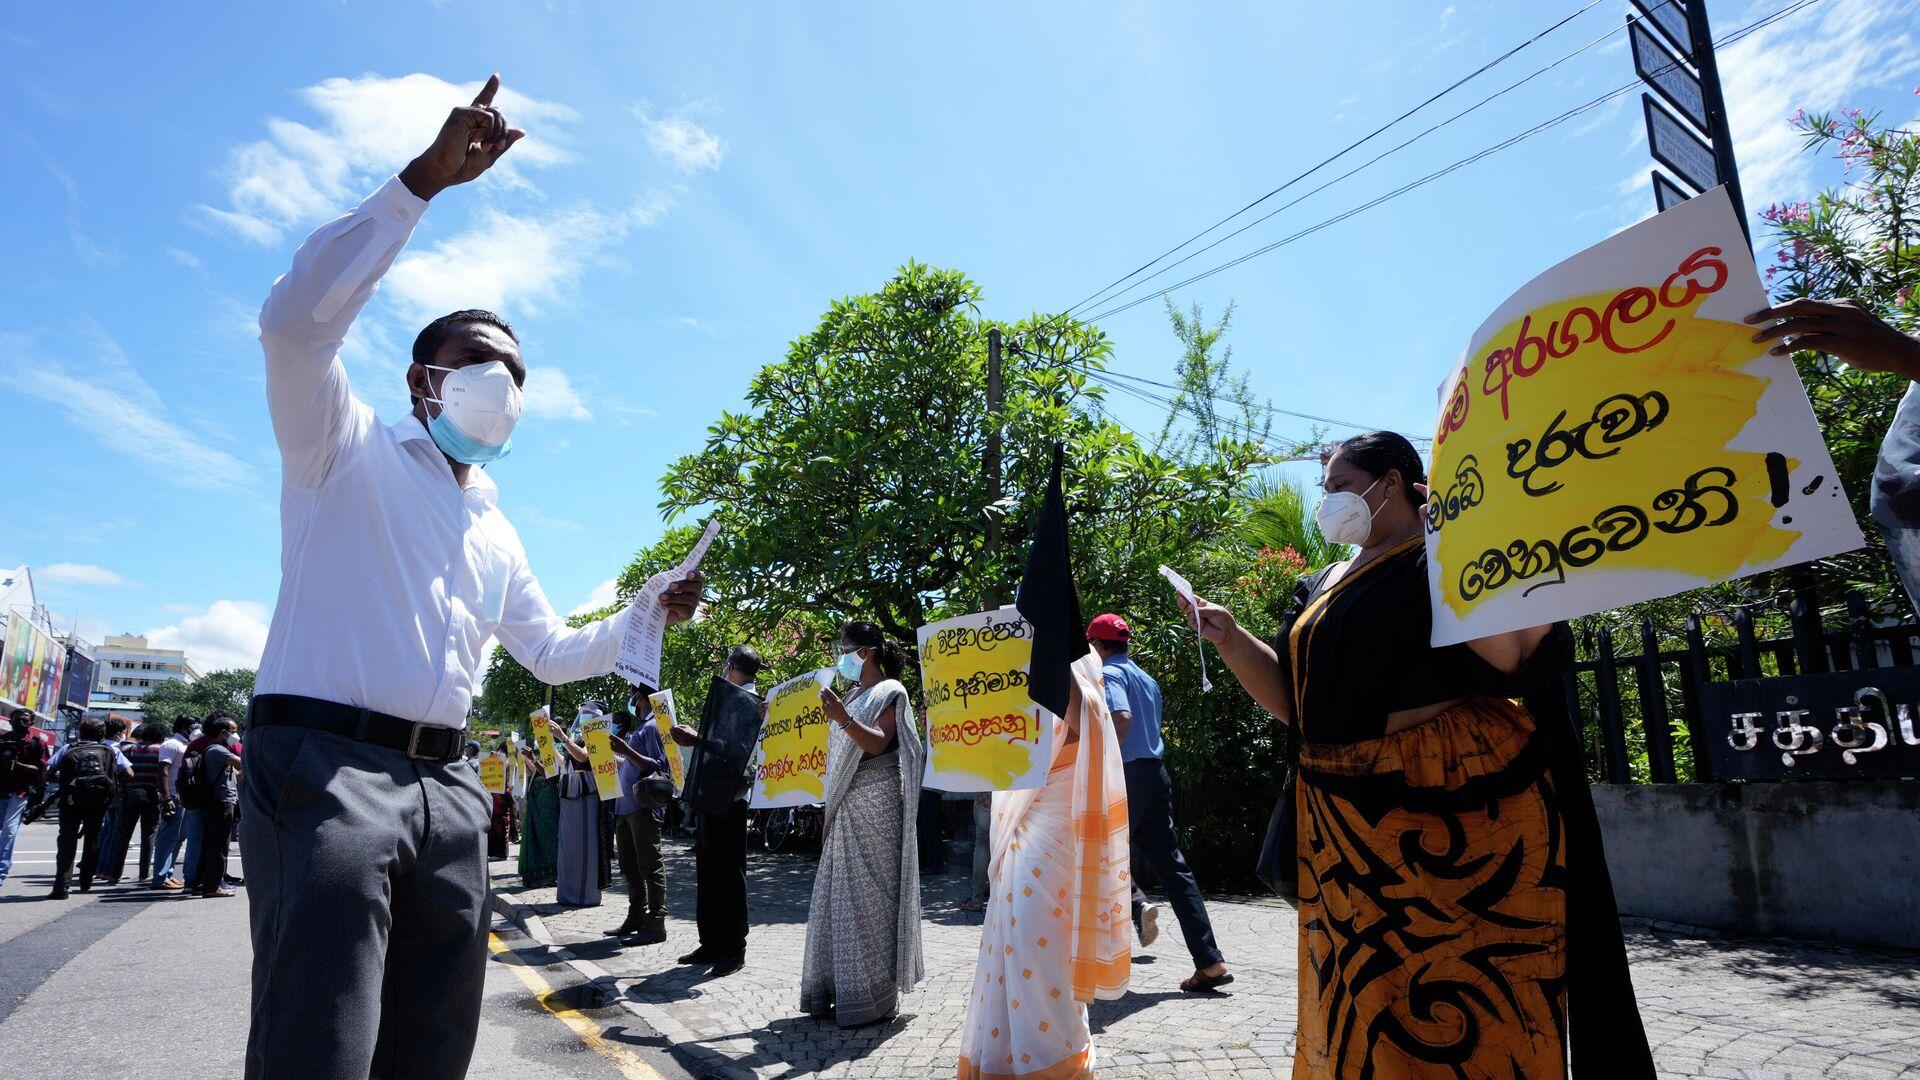 Lehrerstreik in Sri Lanka am 6. Oktober 2021 - SNA, 1920, 06.10.2021